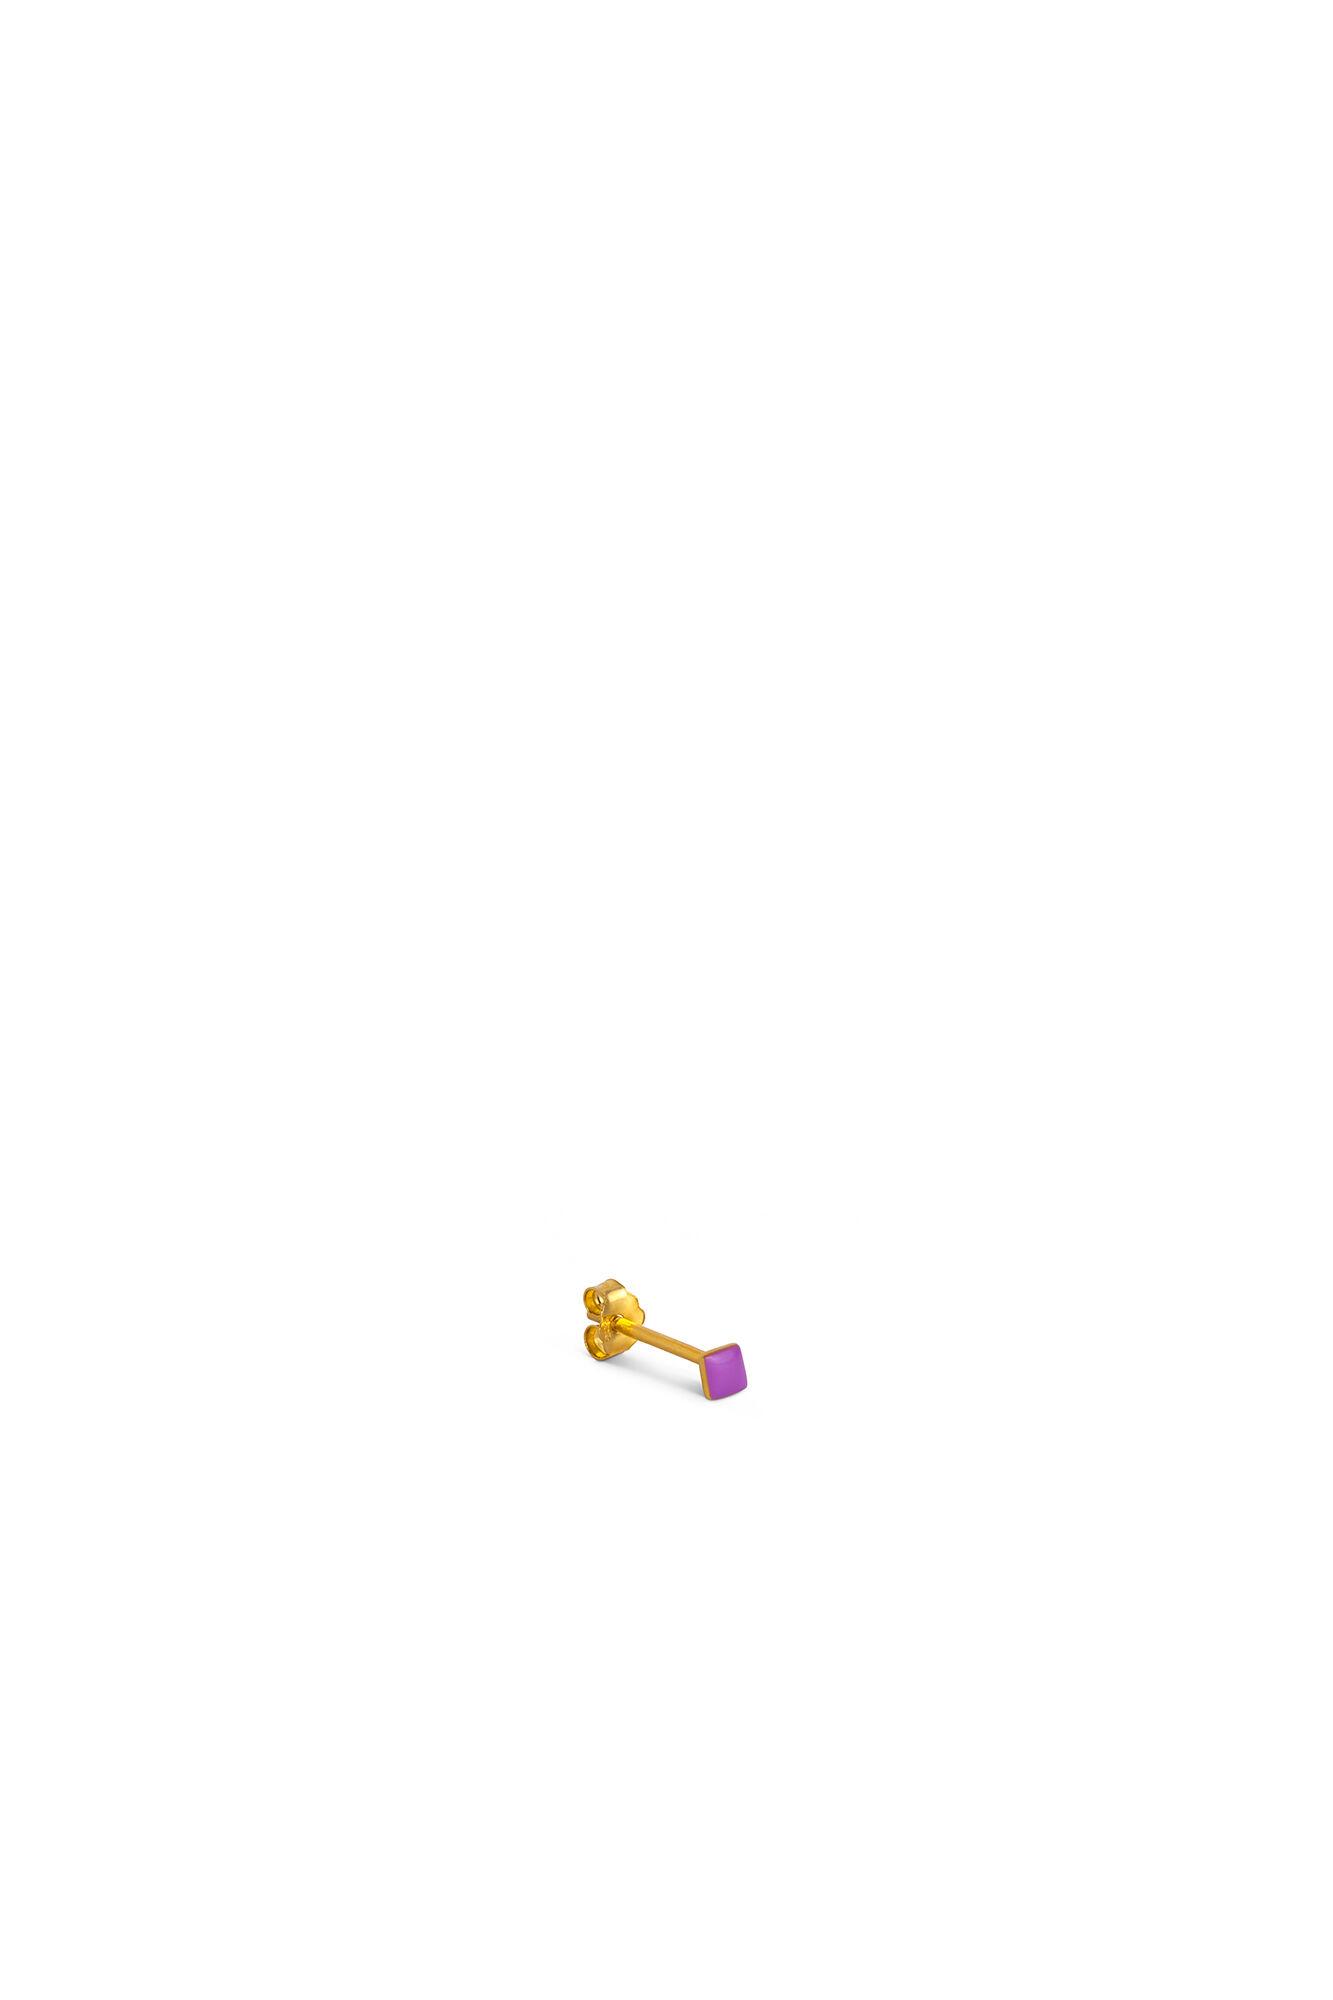 Confetti LULUE184, MAGIC PURPLE